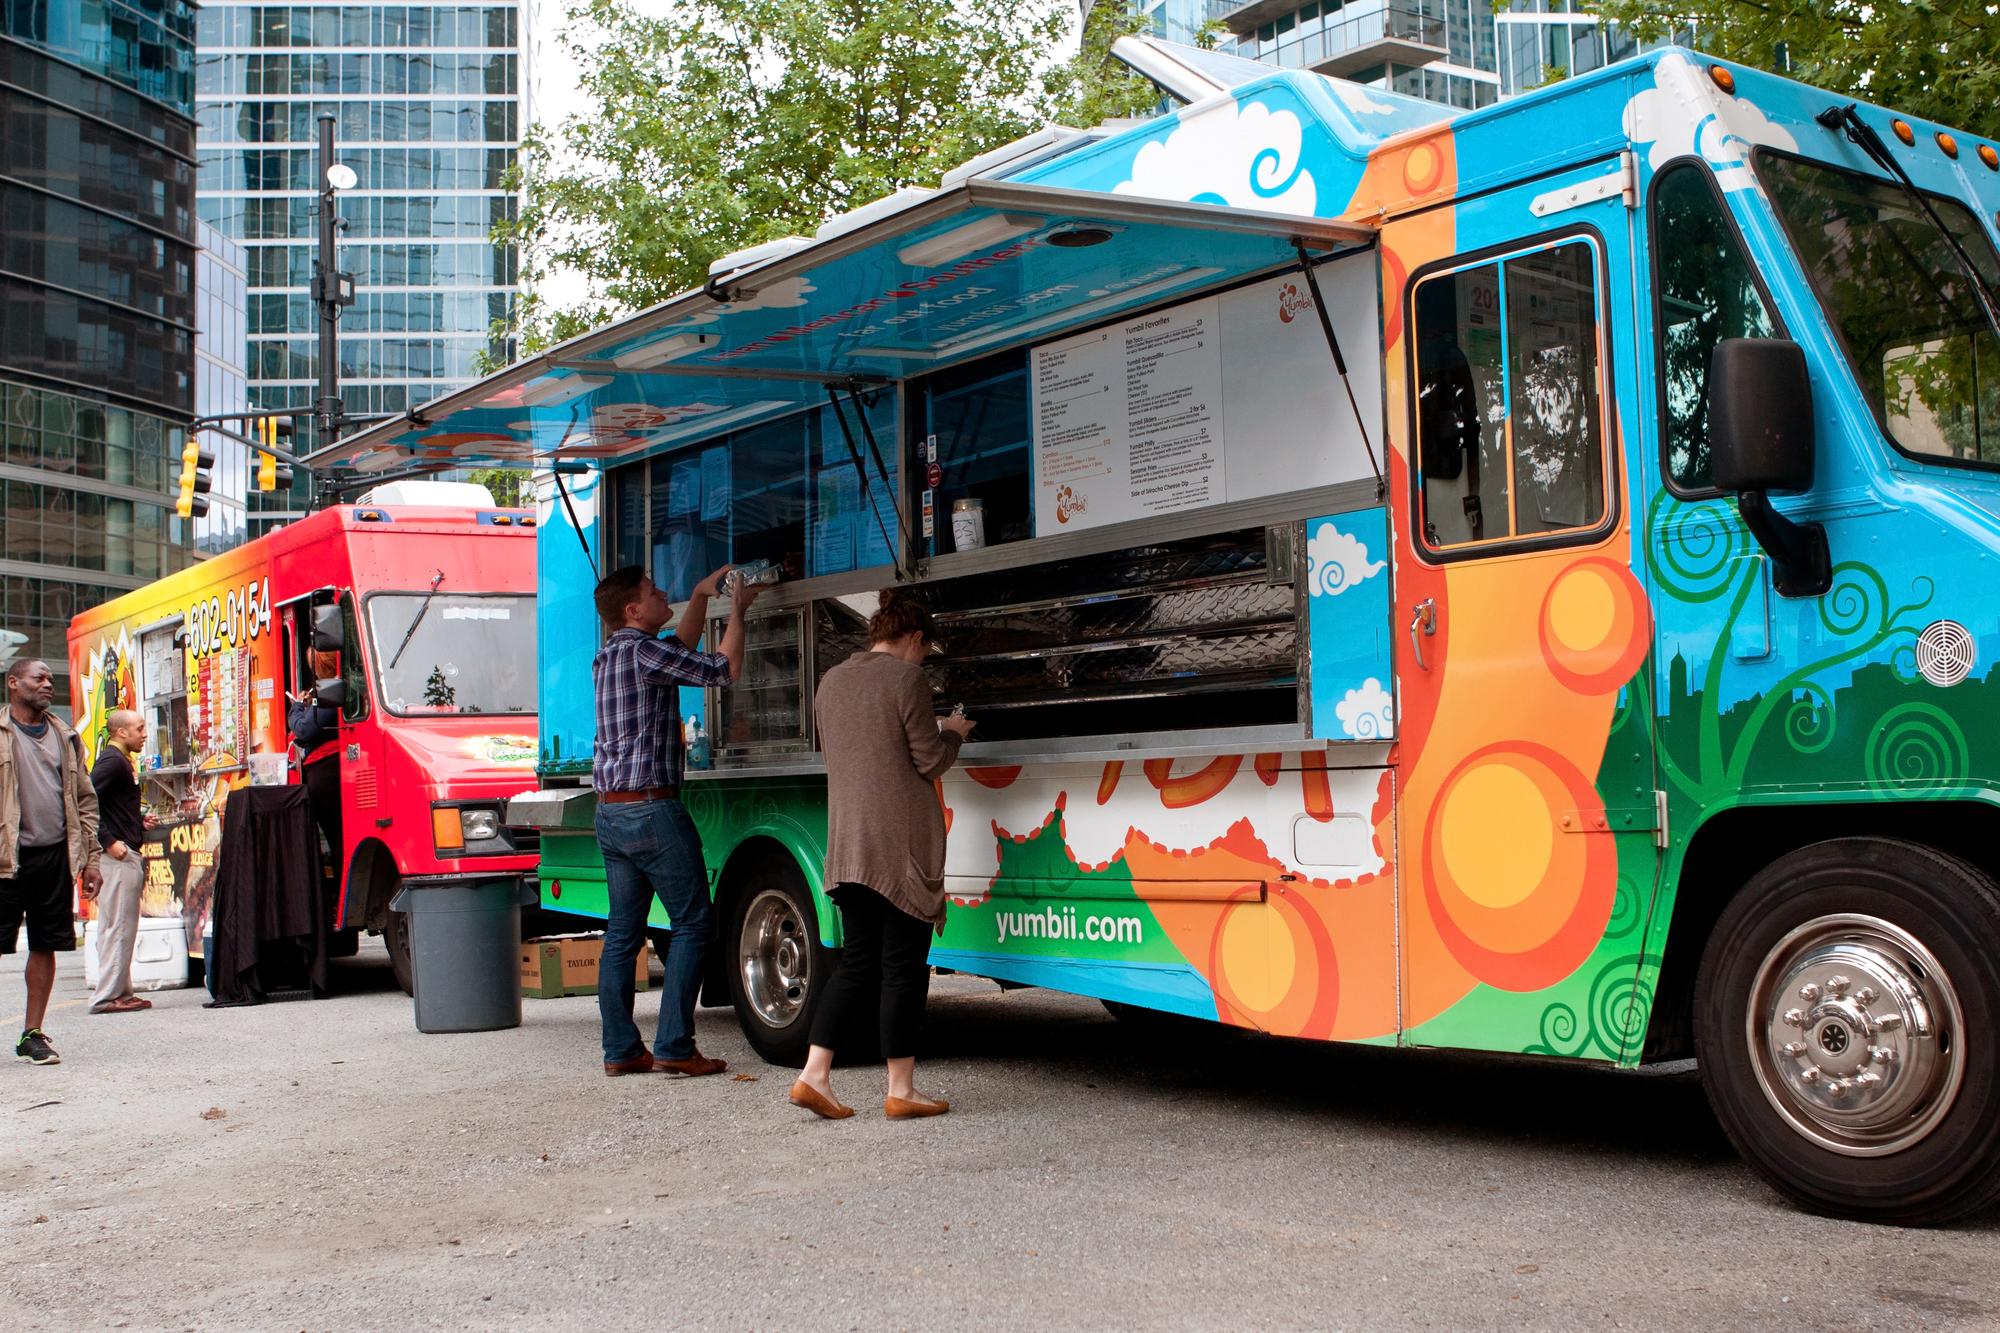 Food Truck Basics: Creating Food Truck Menus - Zac's Burgers